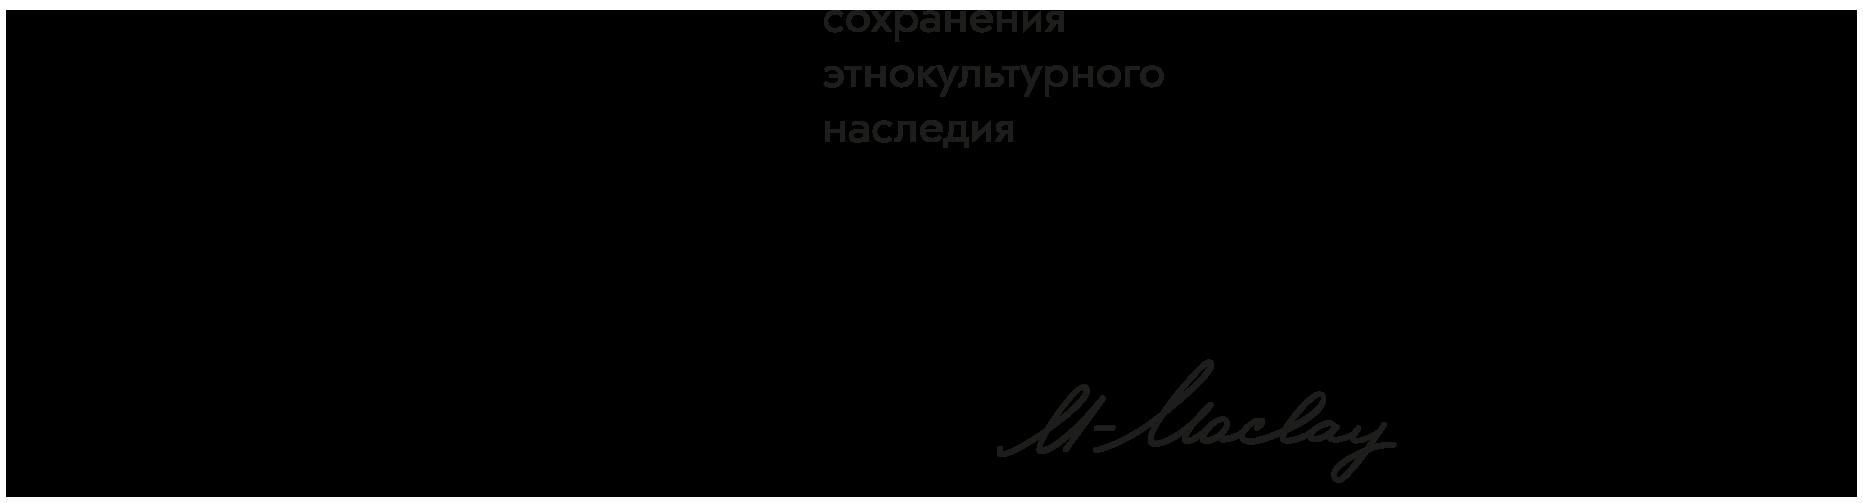 logo-rus-1